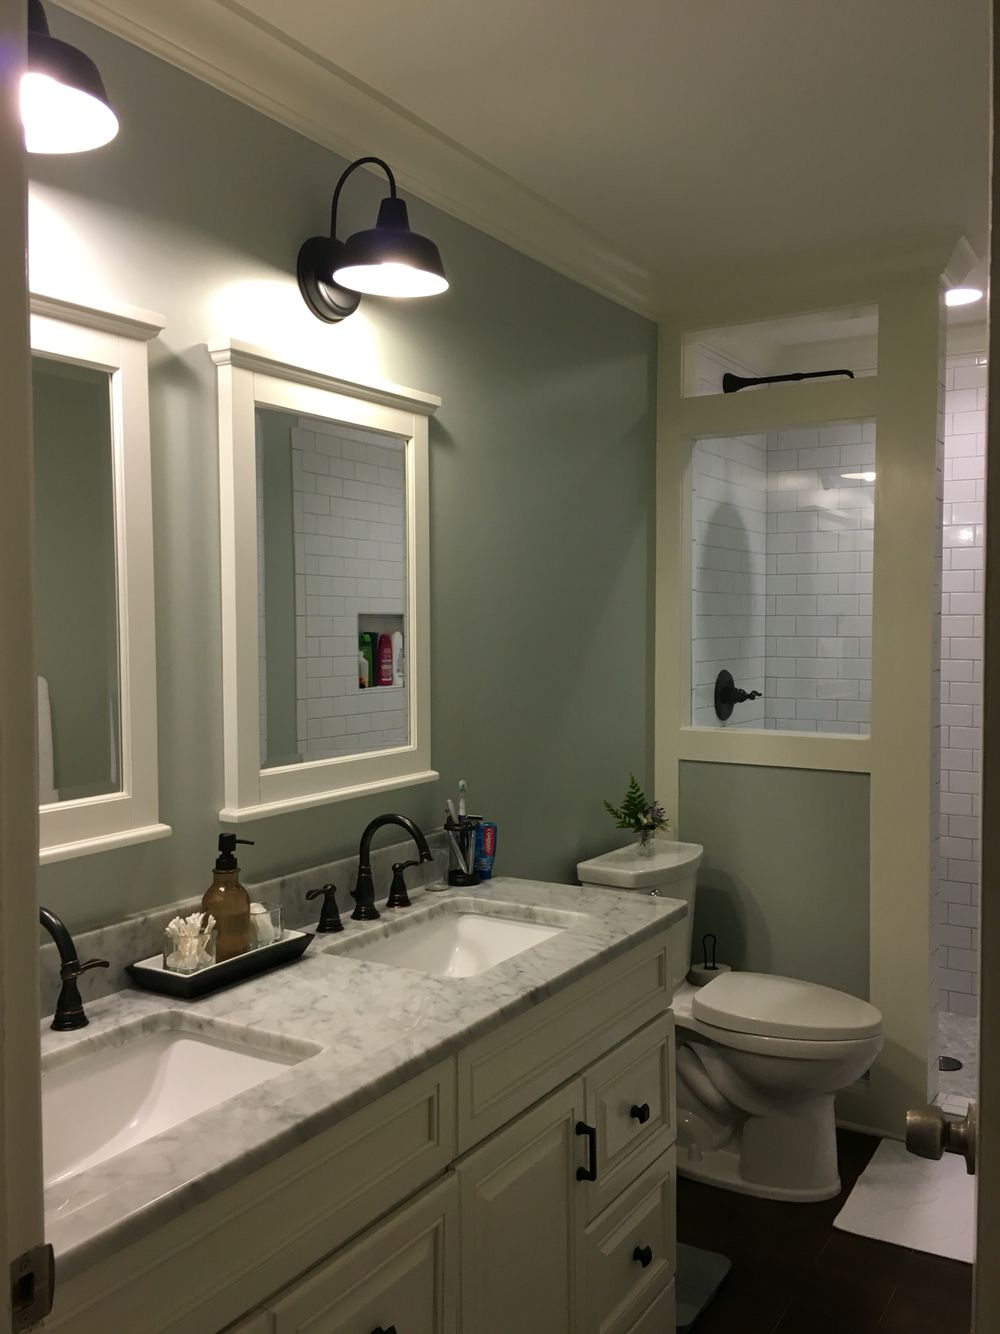 our new master bath so happy with it bathrooms remodel on bathroom renovation ideas nz id=25559